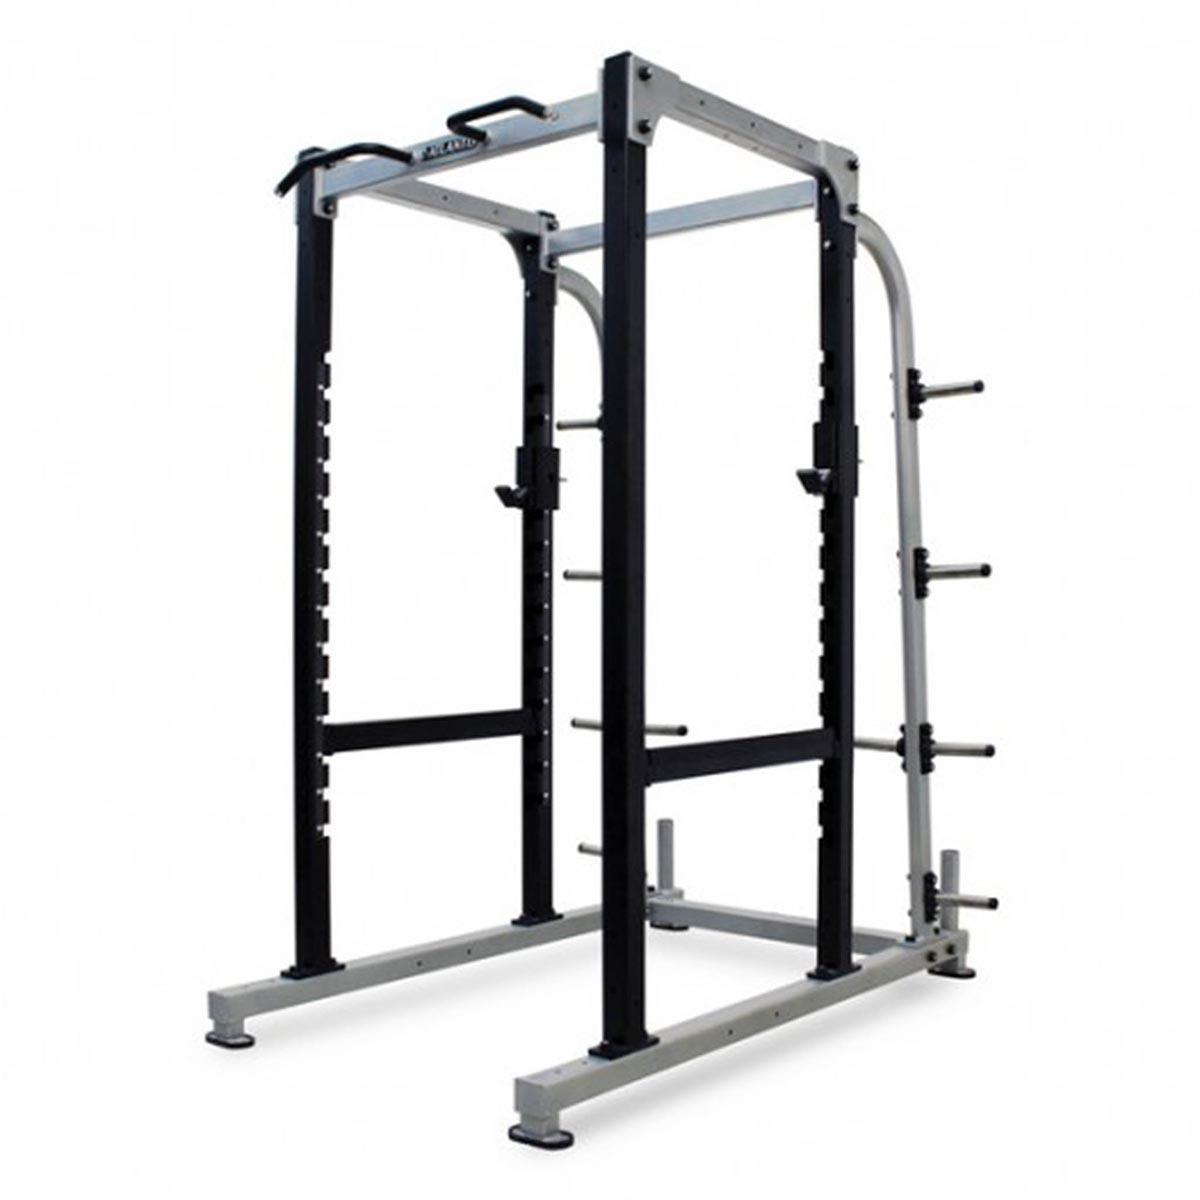 Vancouver Free Weights - Atlantis C409 Power Rack - Lifestyle Equipment